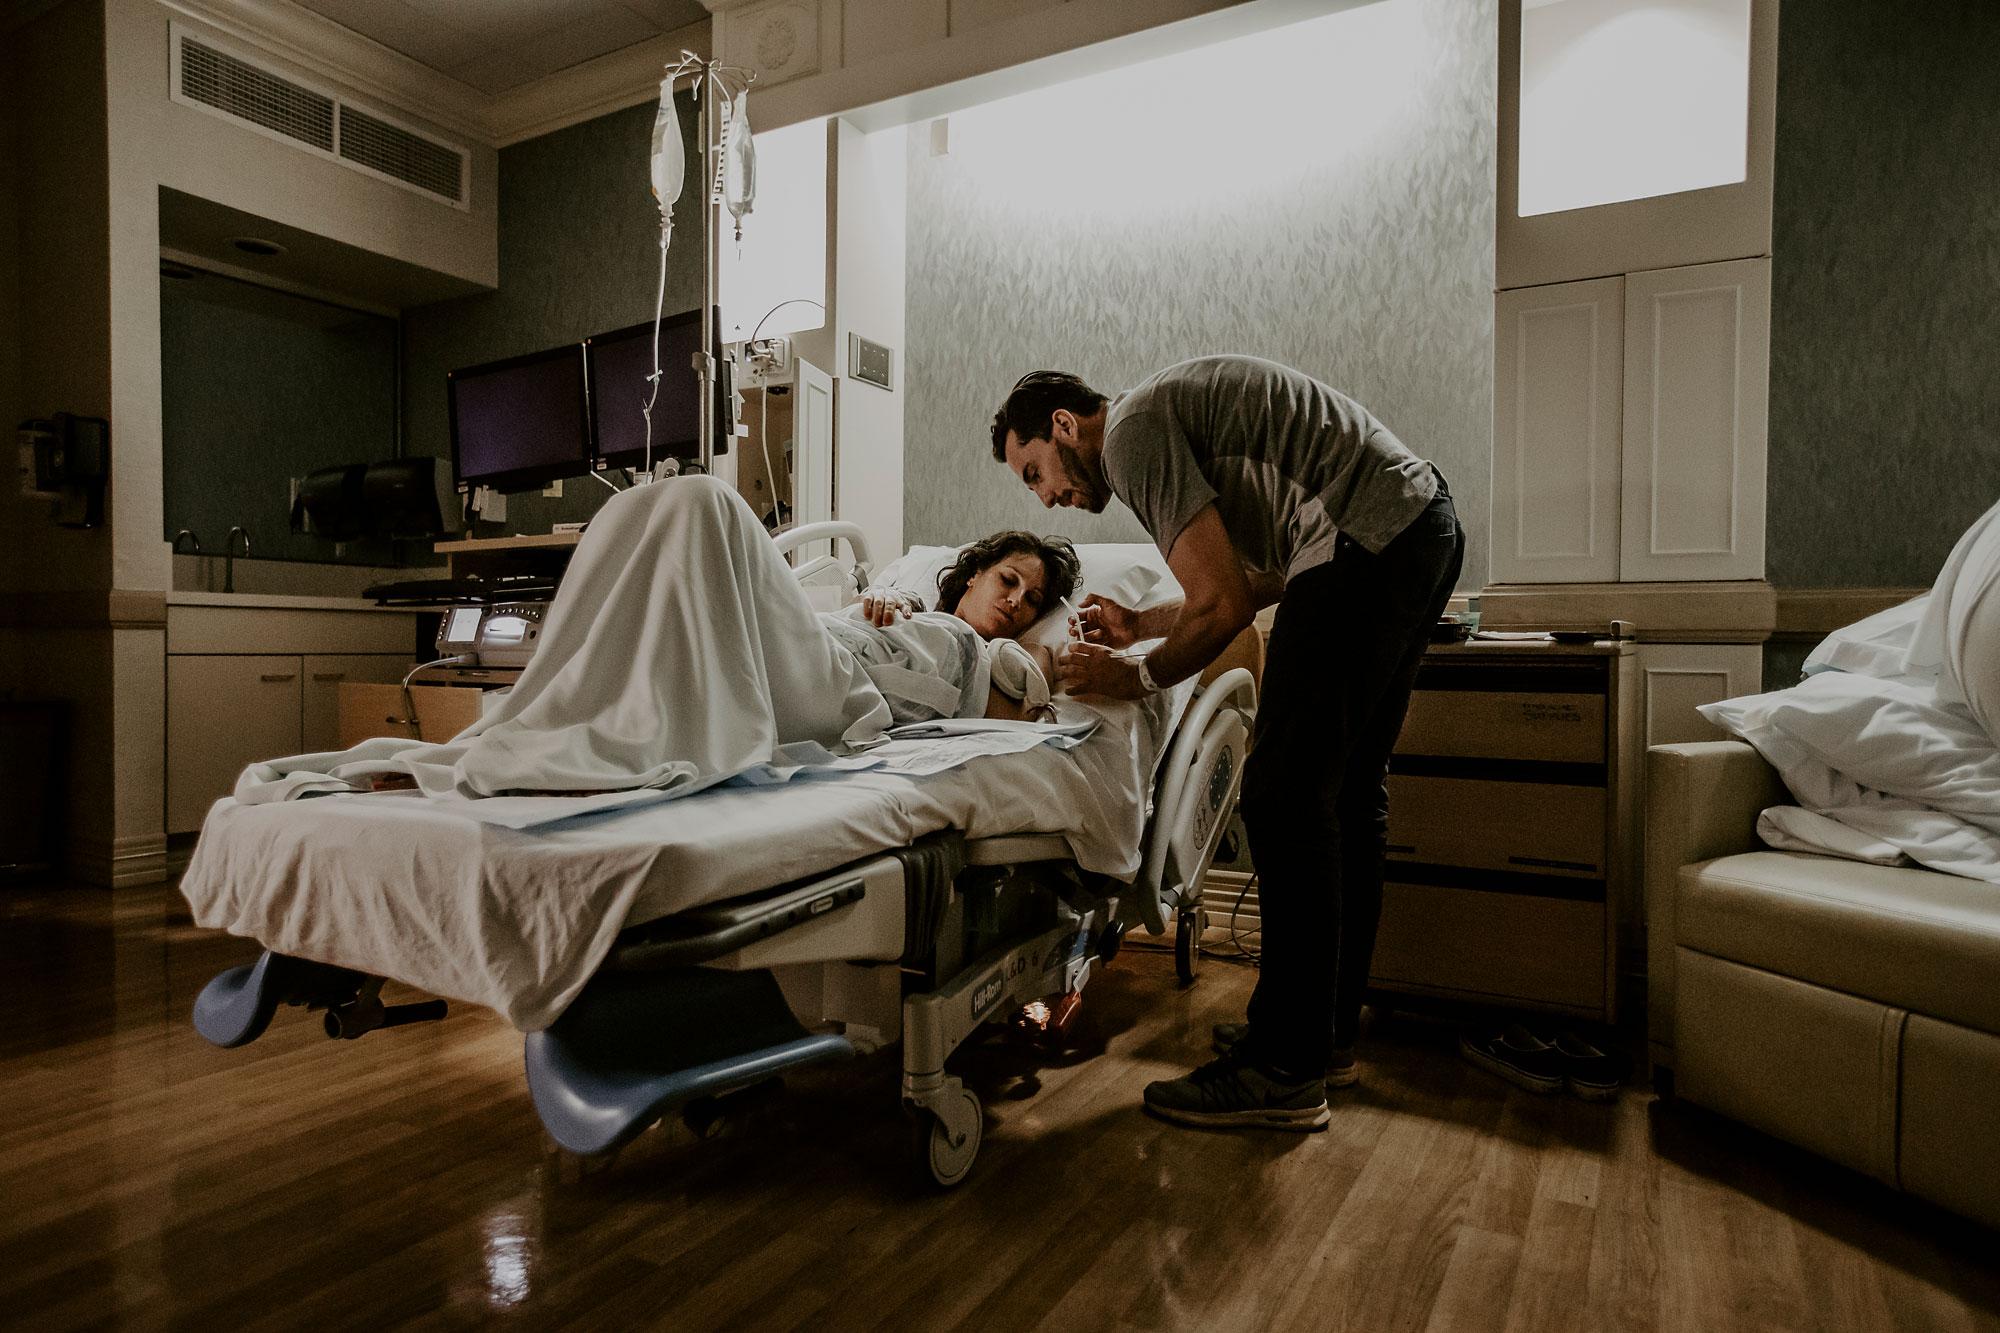 Oahu-Birth-Photographer-Honolulu-Queens-Hospital-The-Sophia-Co-28.jpg